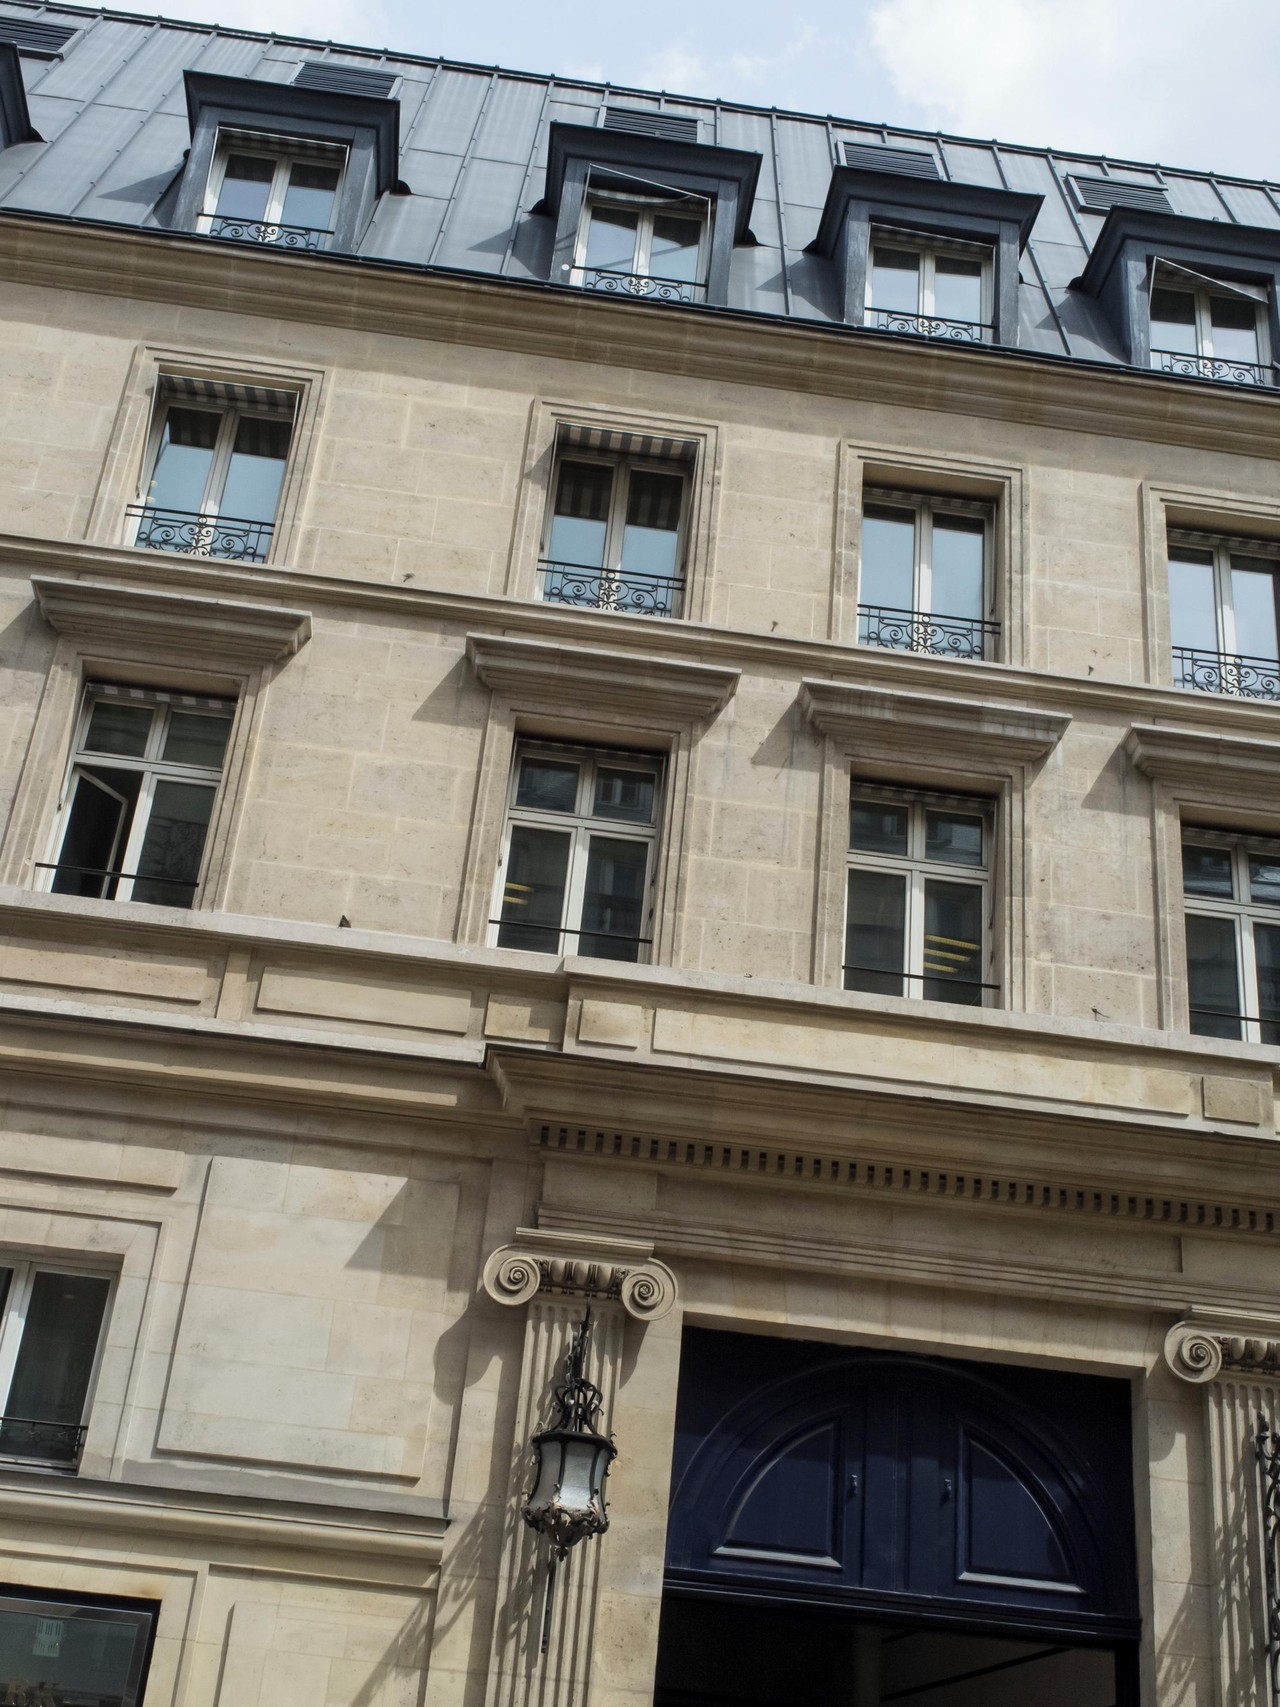 Paris seminar rooms Historisches Gebäude Horn & Wallis image 0